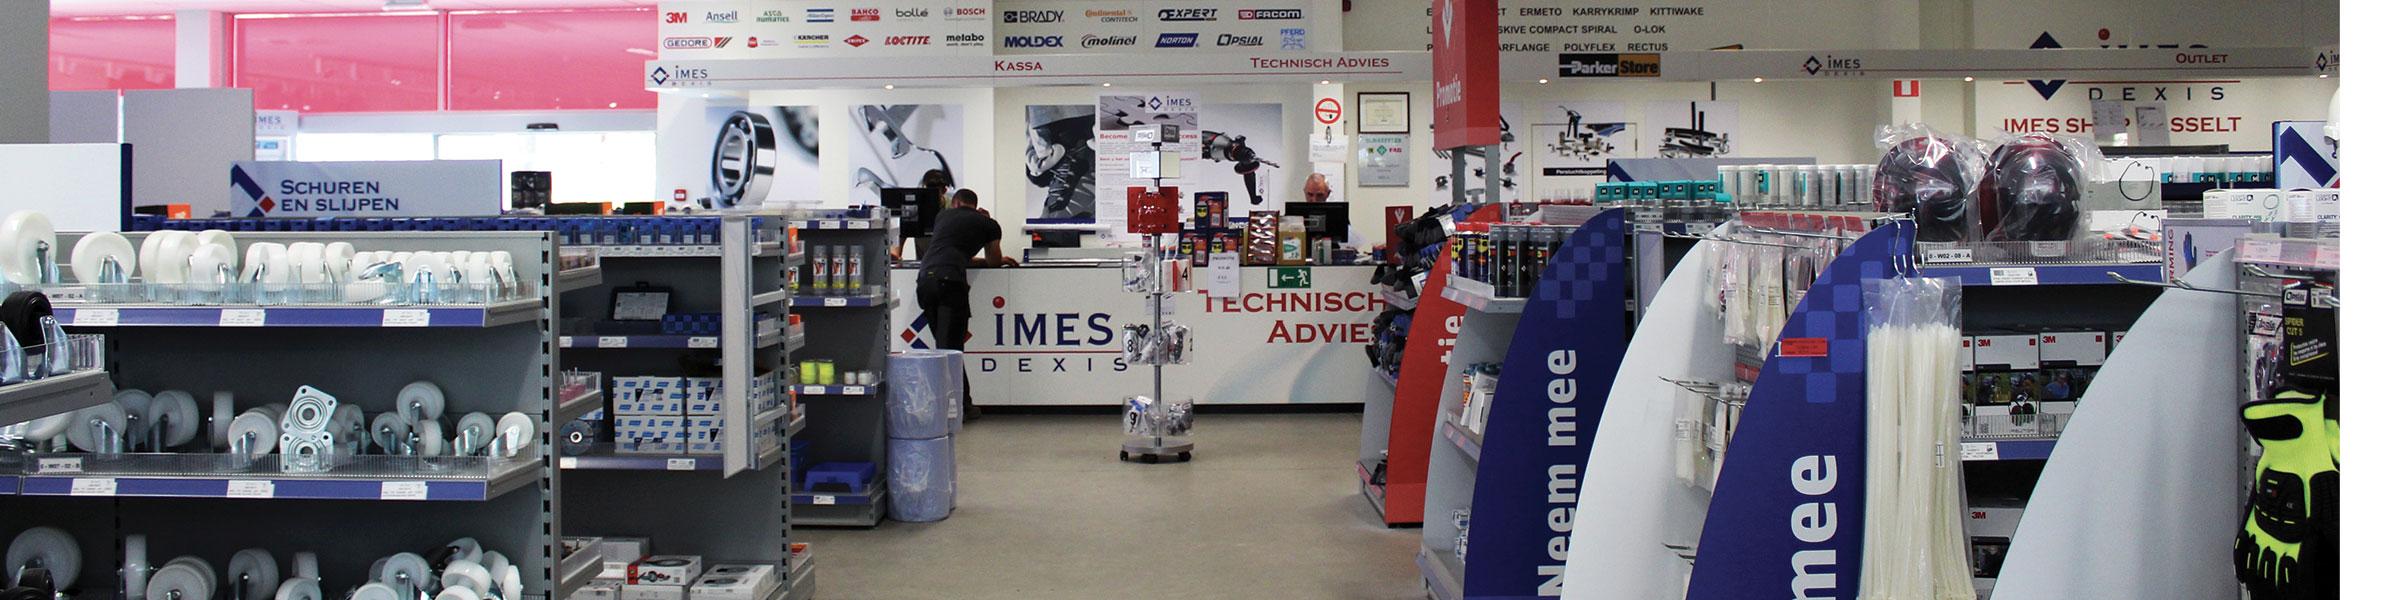 IMES DEXIS Shop Hasselt